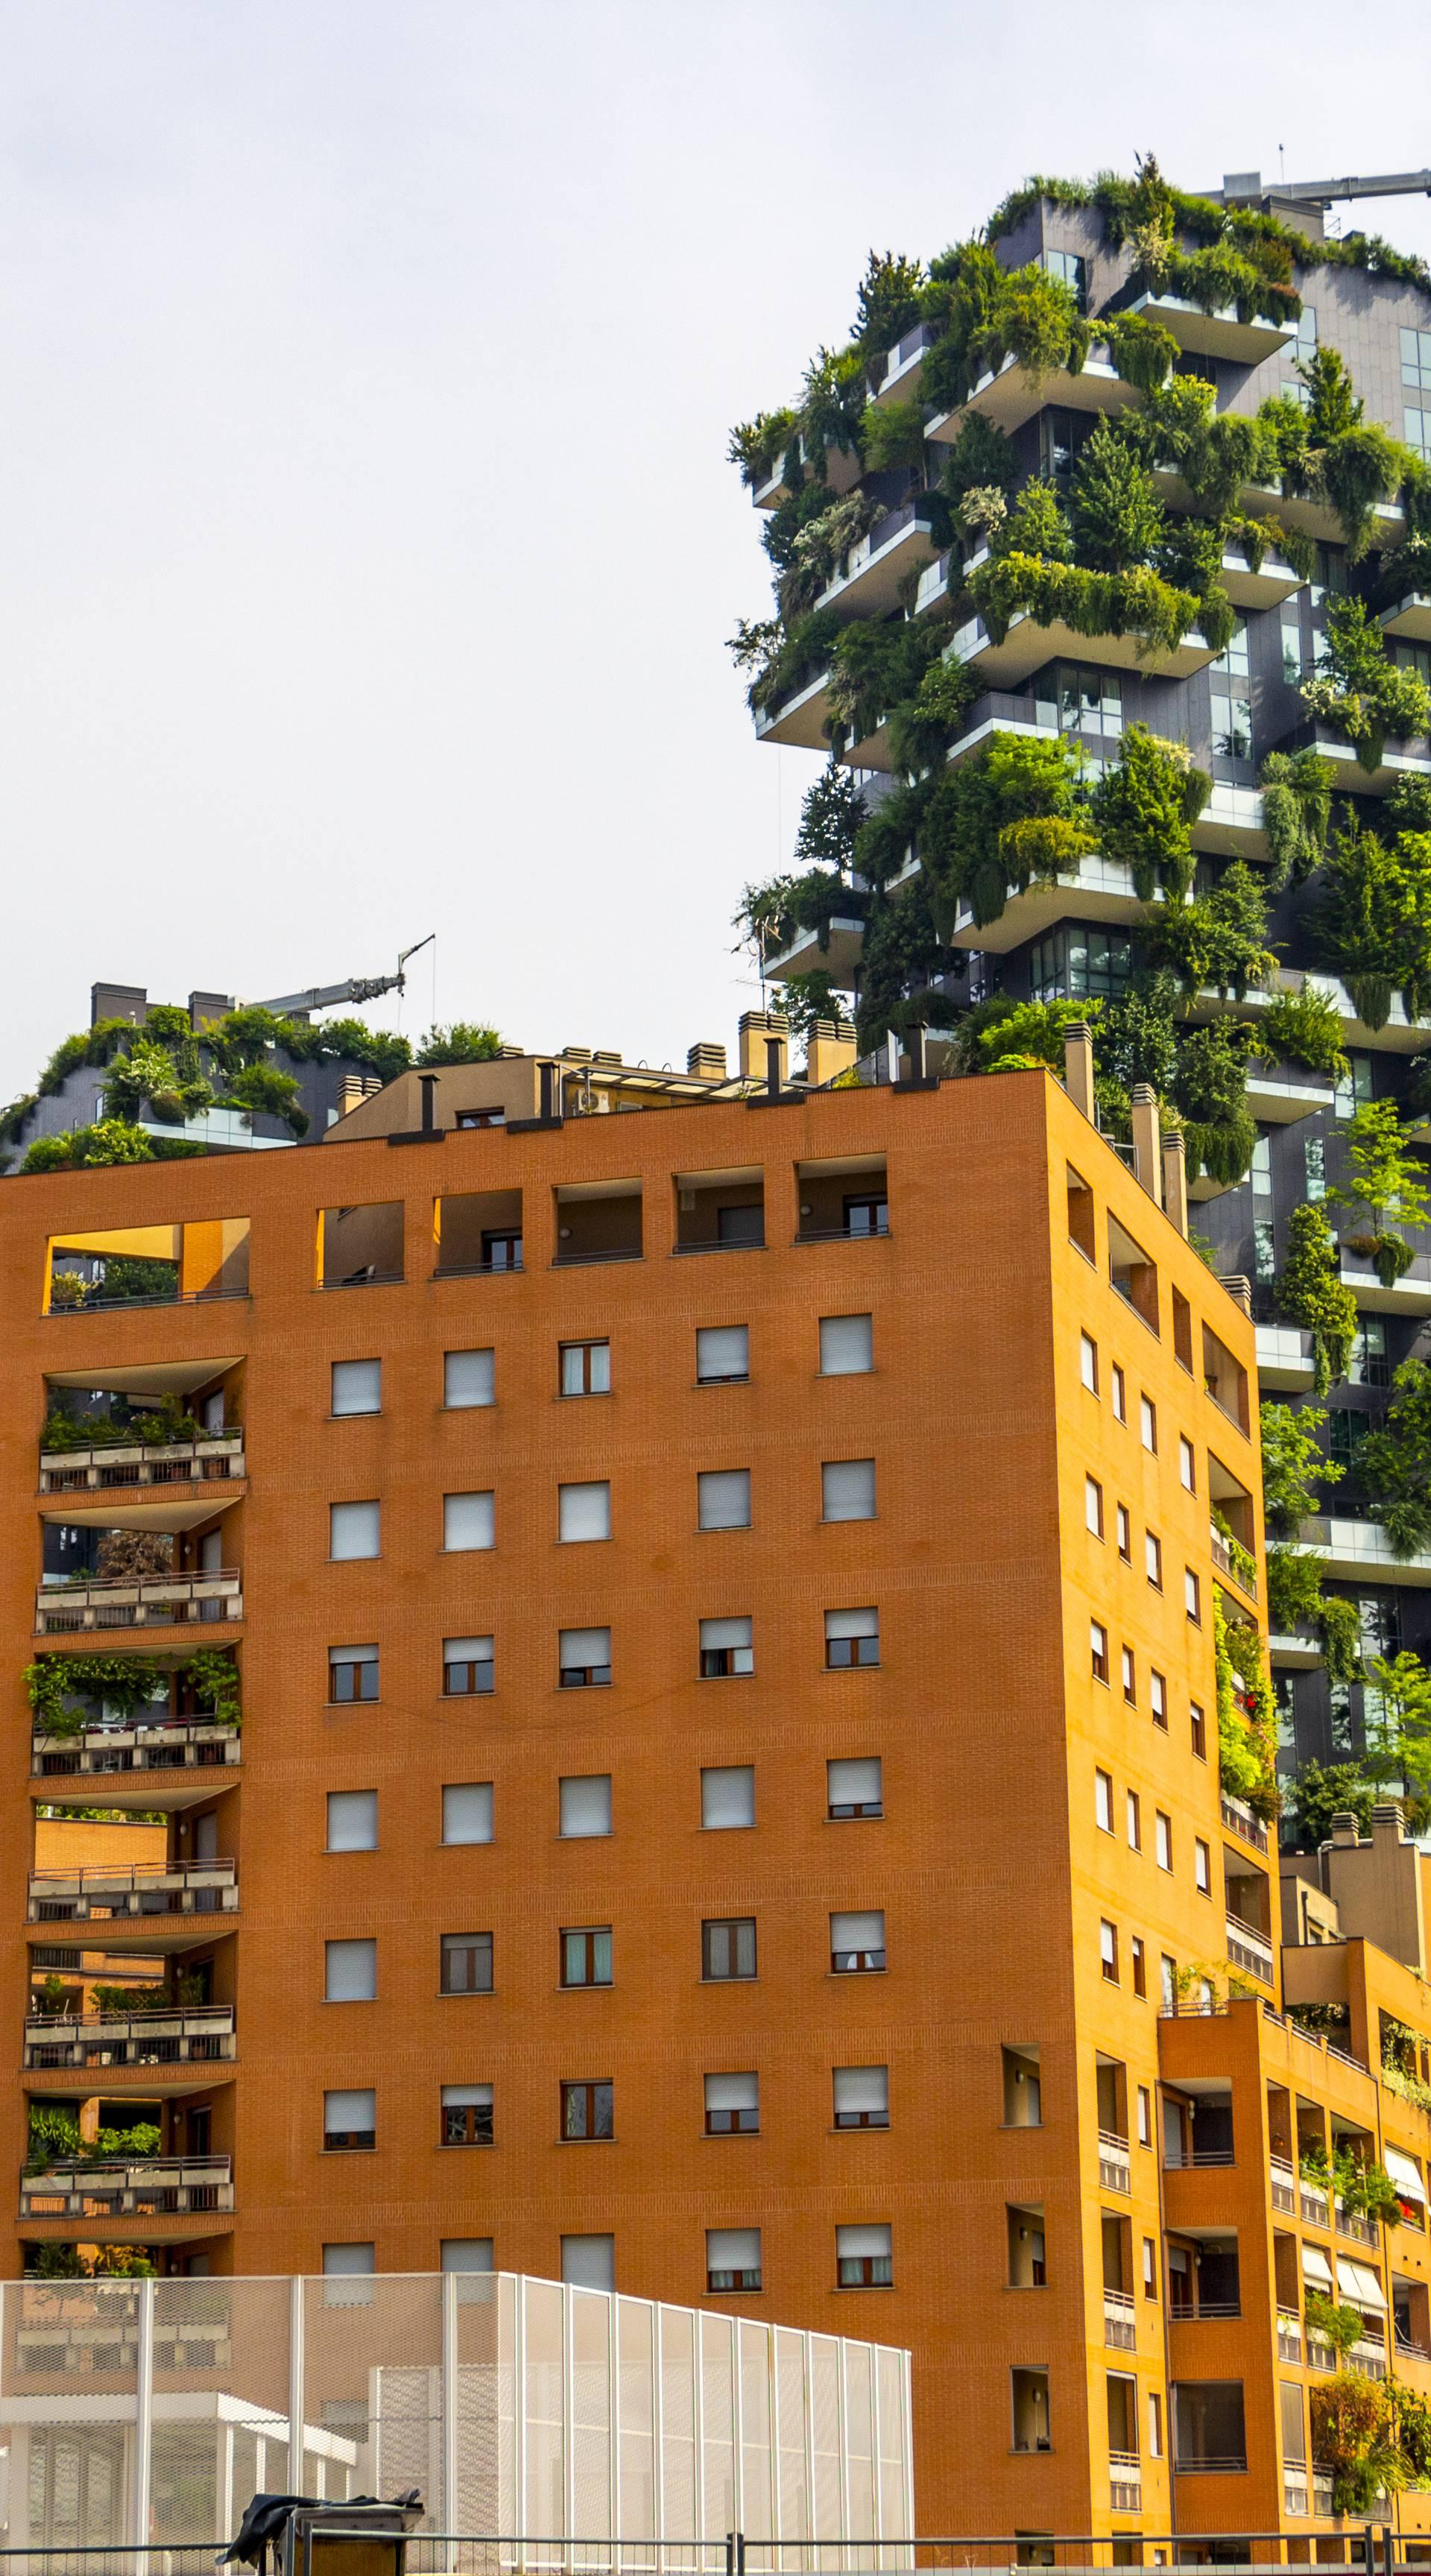 Gradovi budućnosti: Vertikalne šume spasit će nam zelenilo?